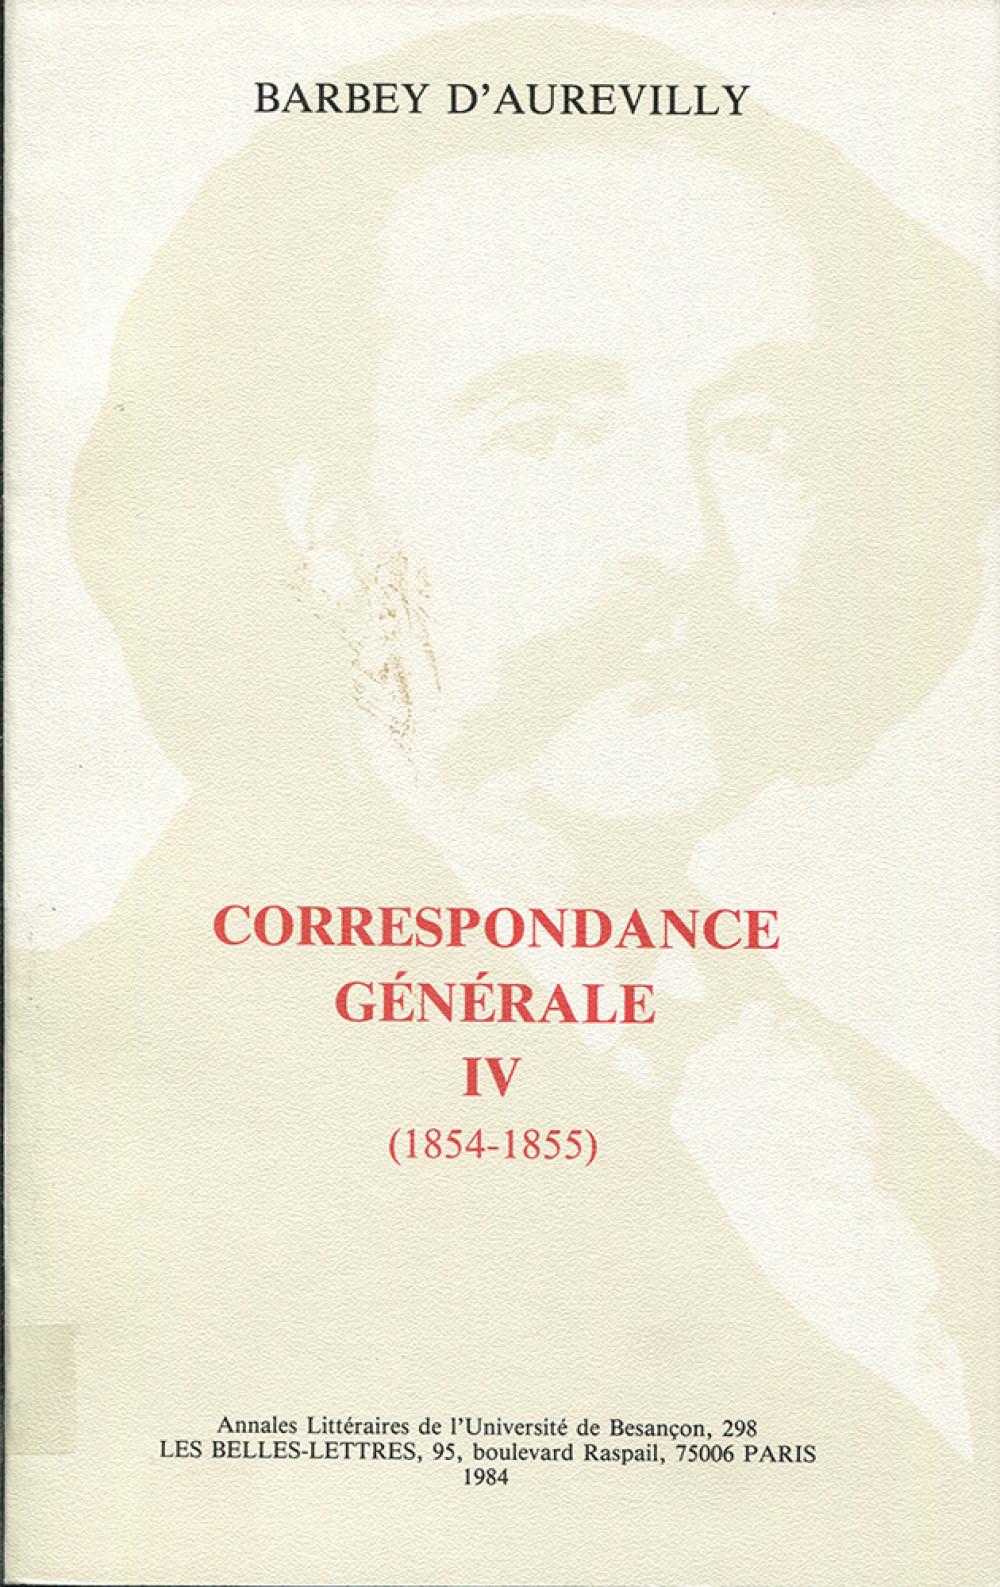 Barbey d'Aurevilly. Correspondance générale IV (1854-1855)